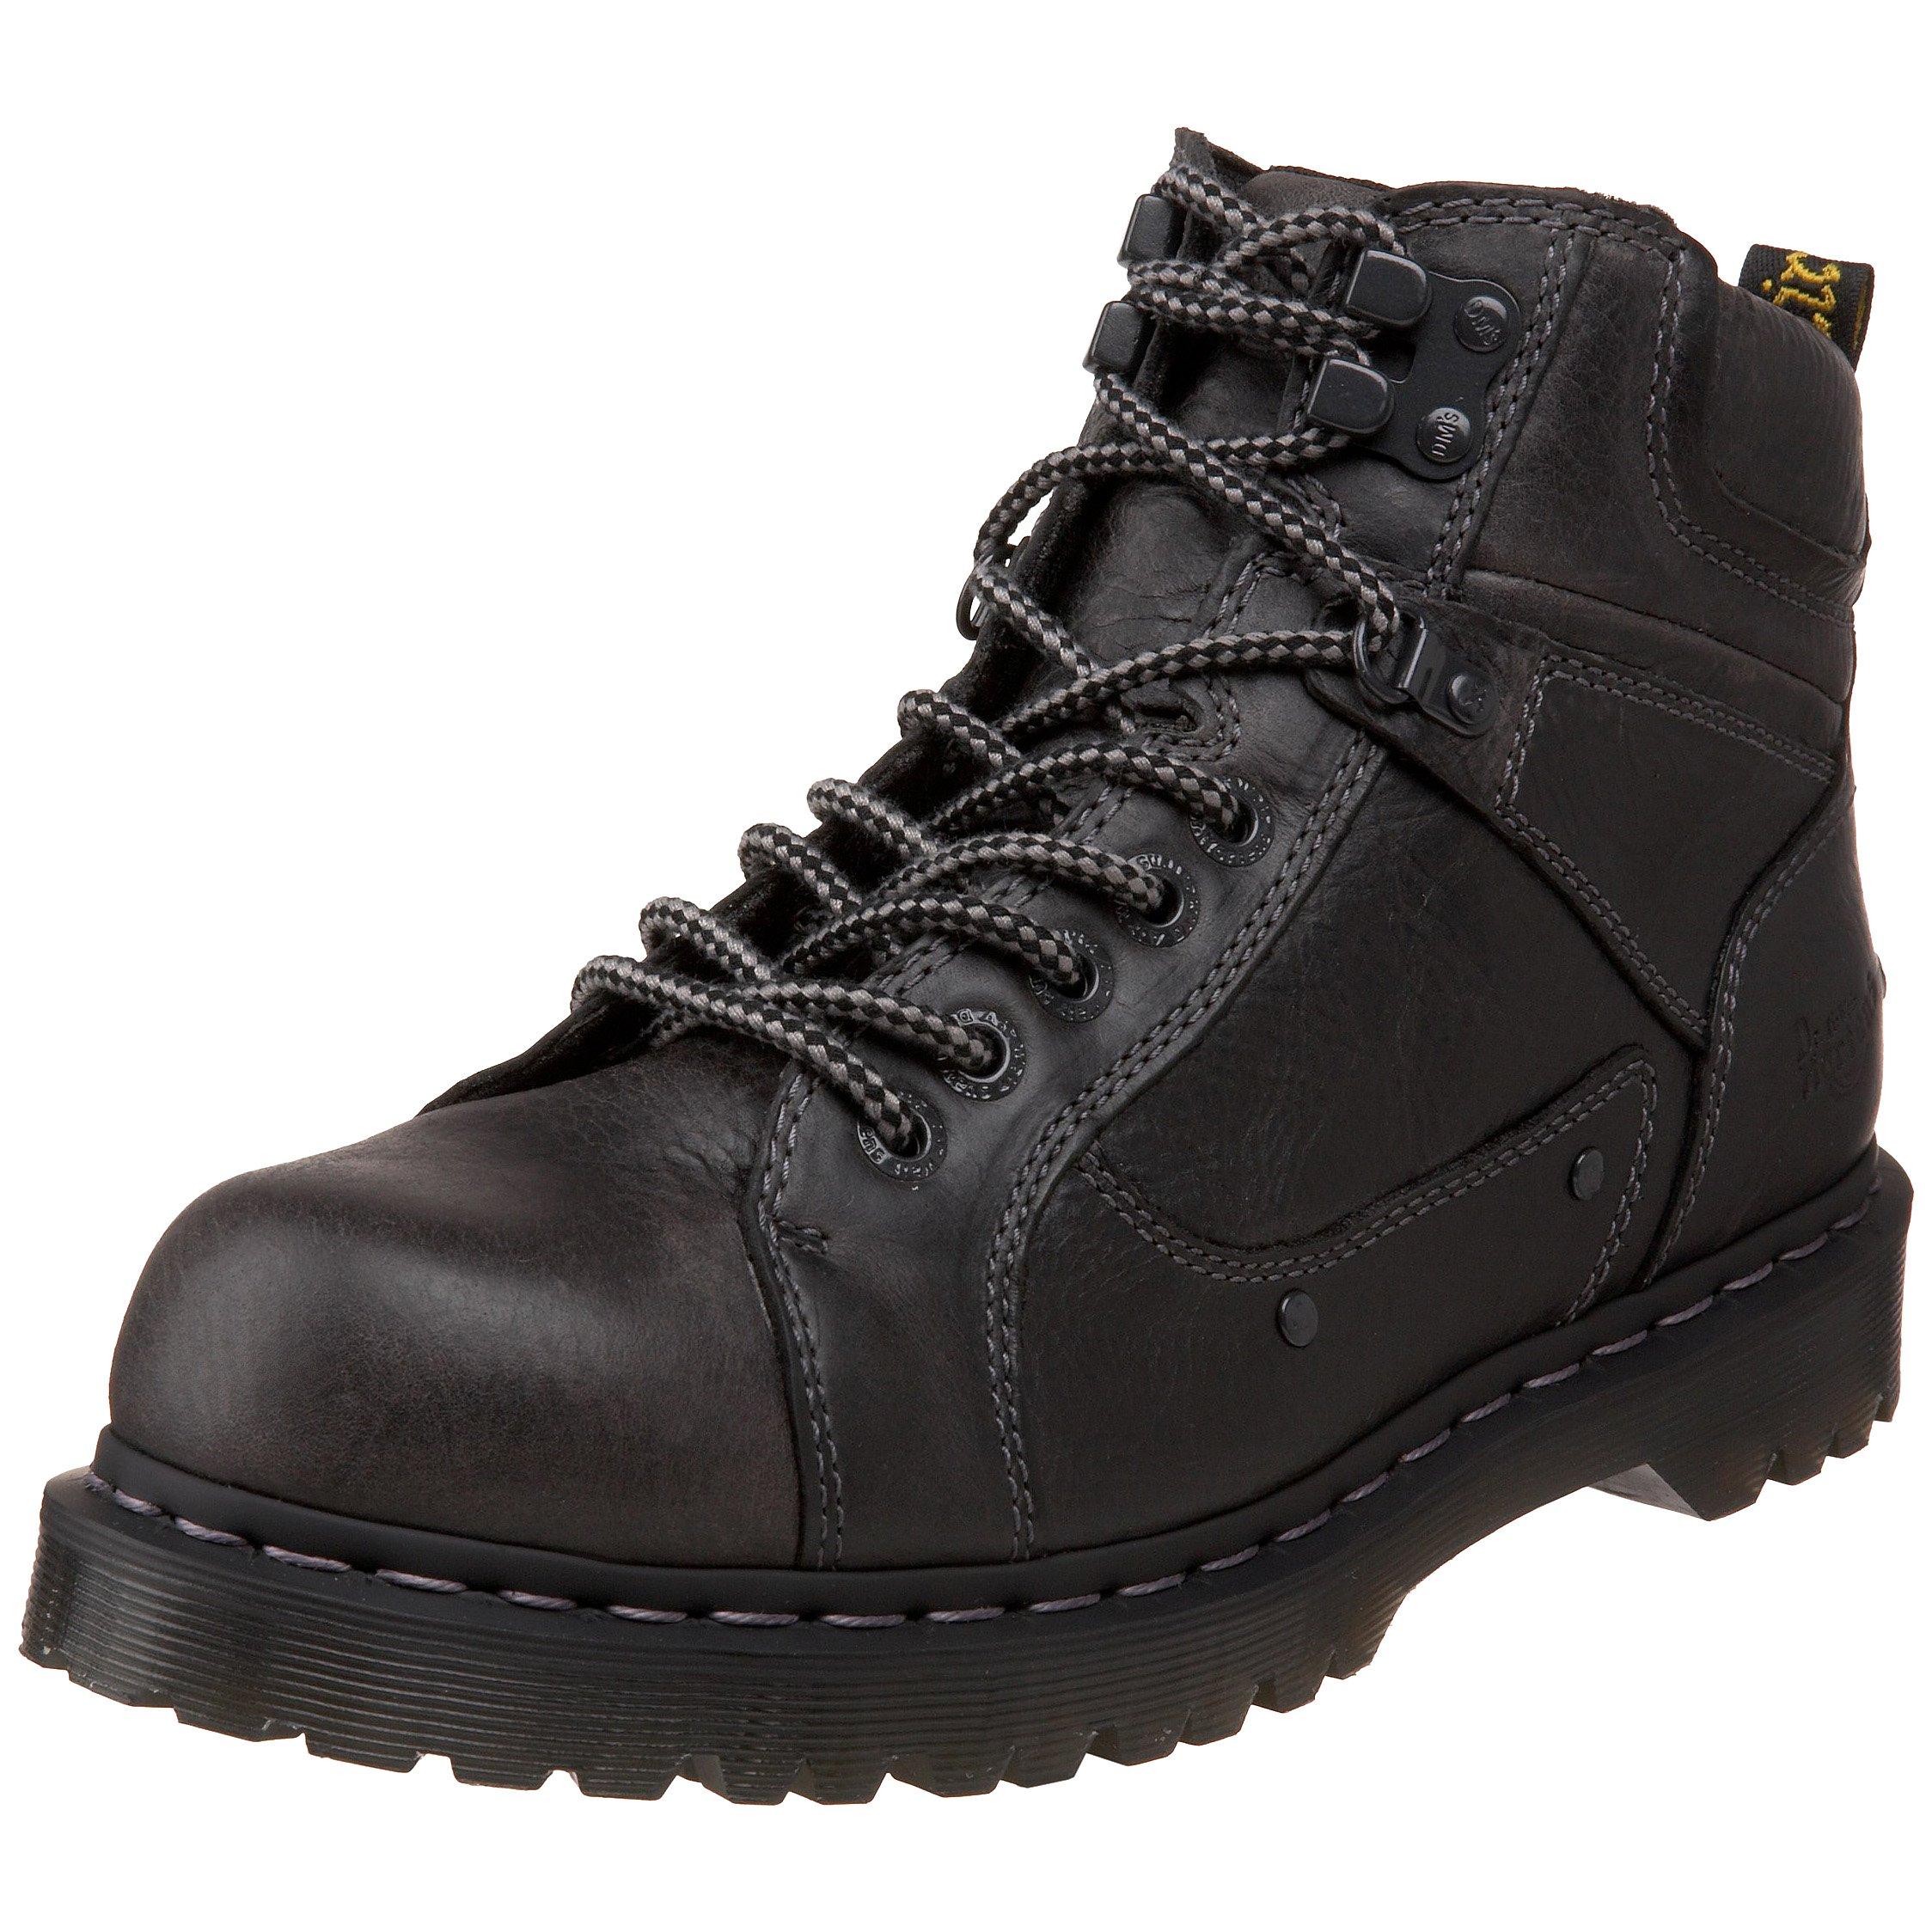 Dr. Martens Men's Diego Lace up Boot,Black,11 F(M) UK/12 D(M) US by Dr. Martens